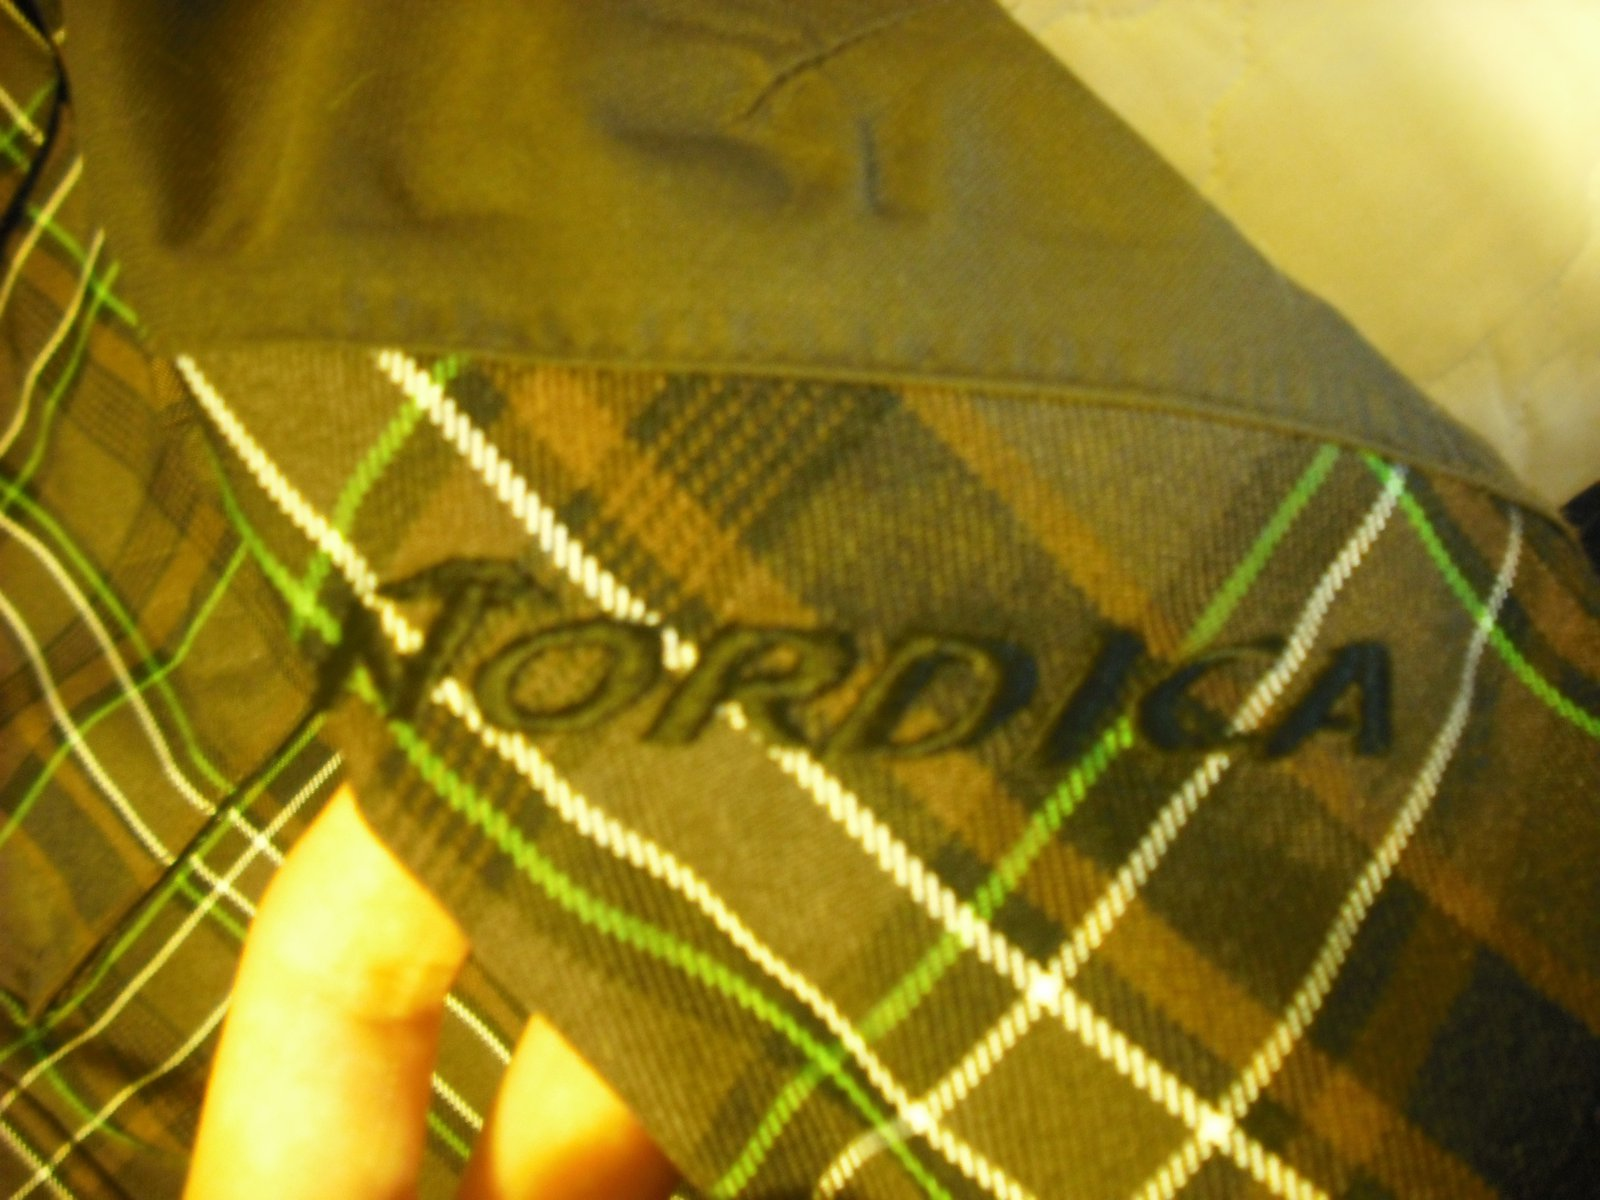 Nordica logo on arm